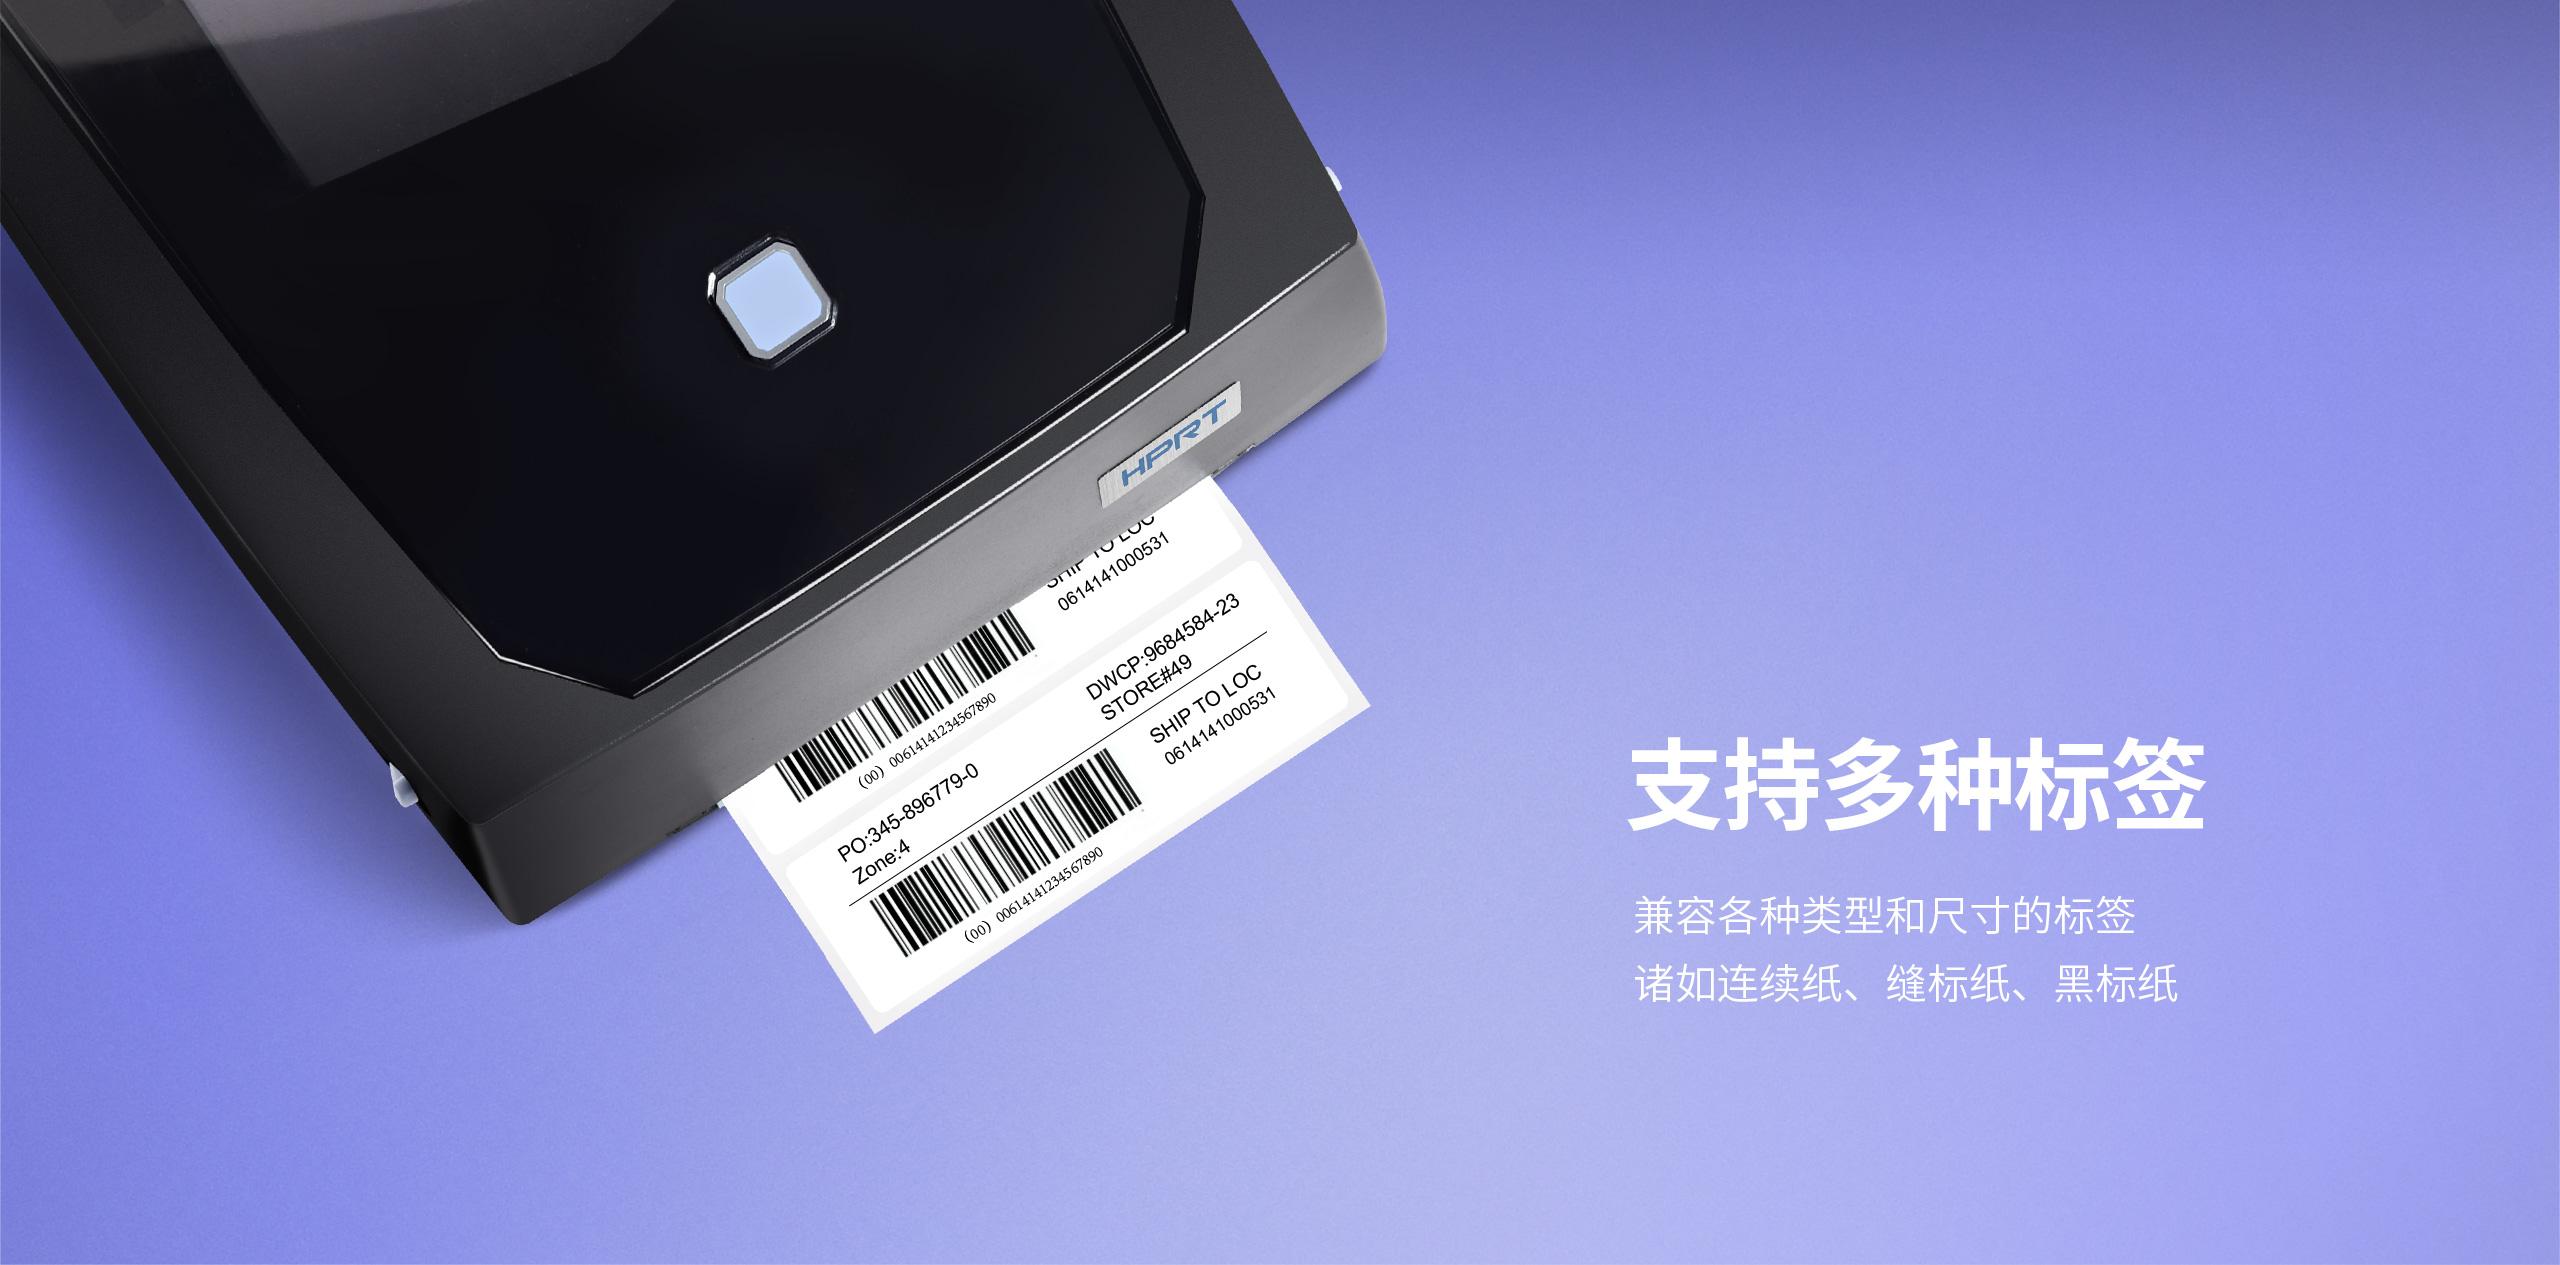 HT100/HT130专业级标签打印机  第5张